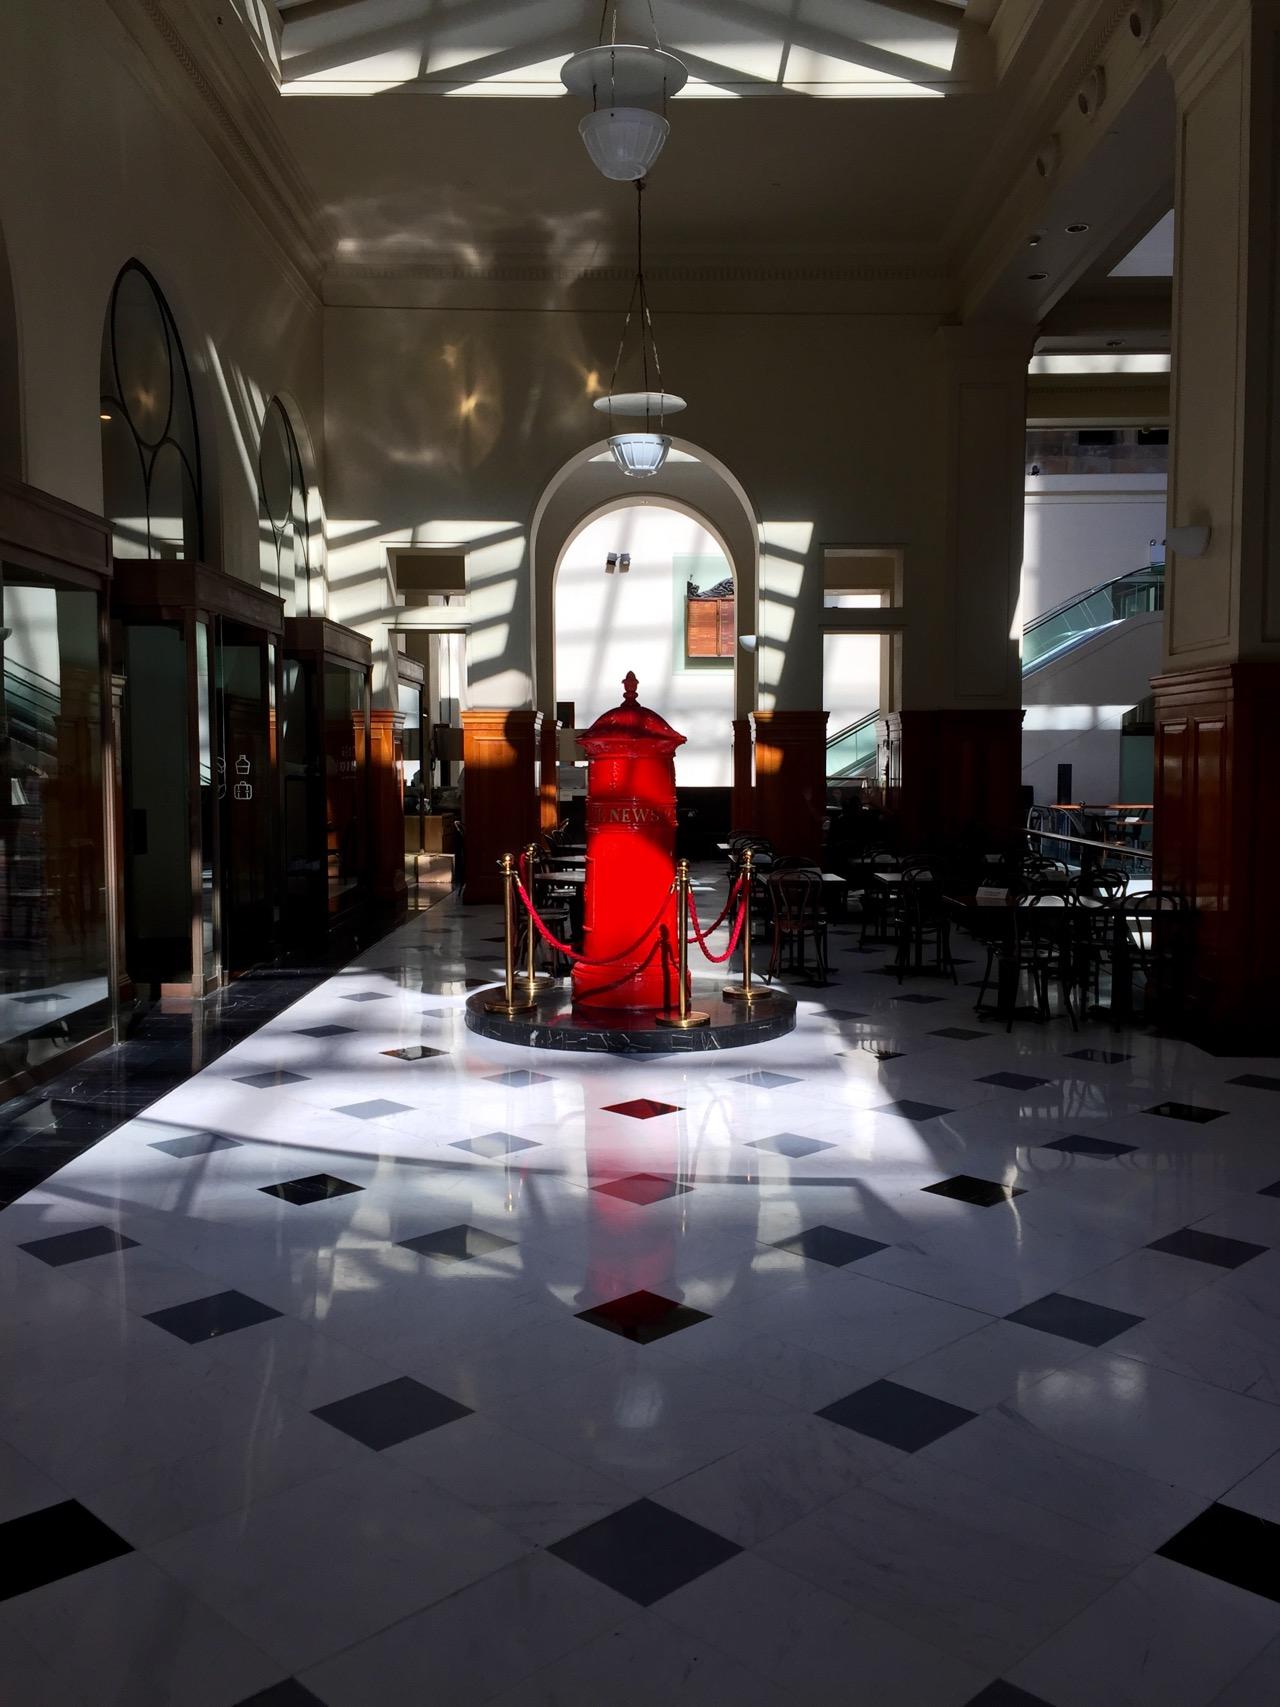 Westin Sydney Lobby - GPO History